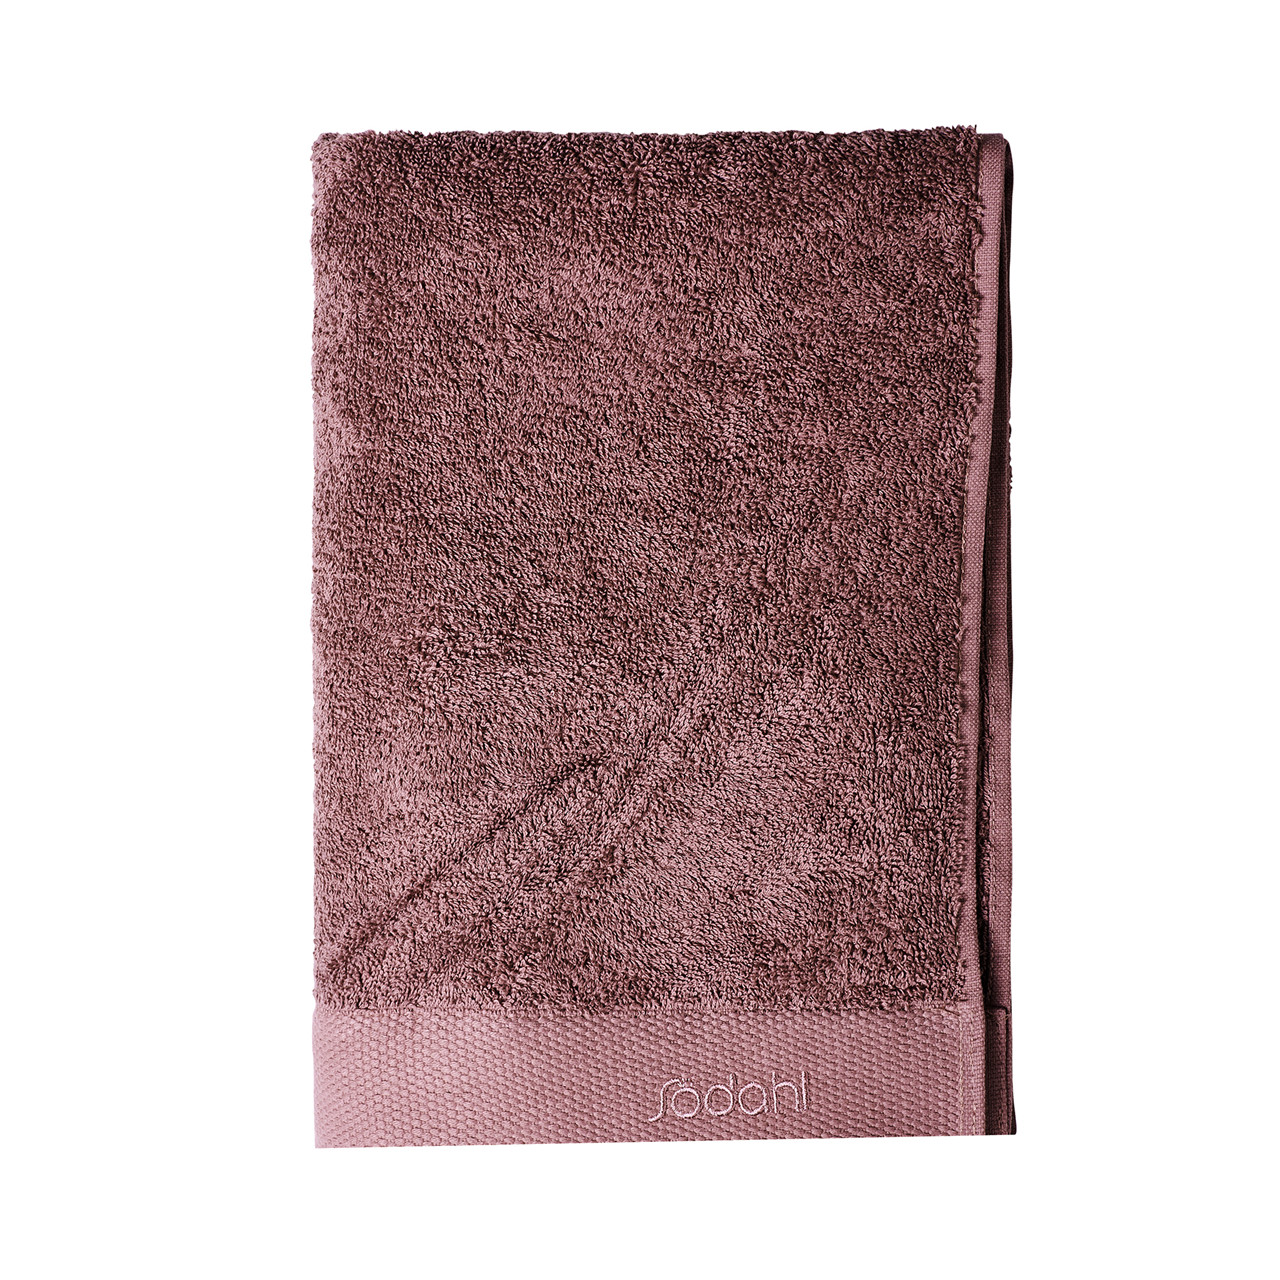 SÖDAHL Comfort håndklæde 70 X 140 dusty berry